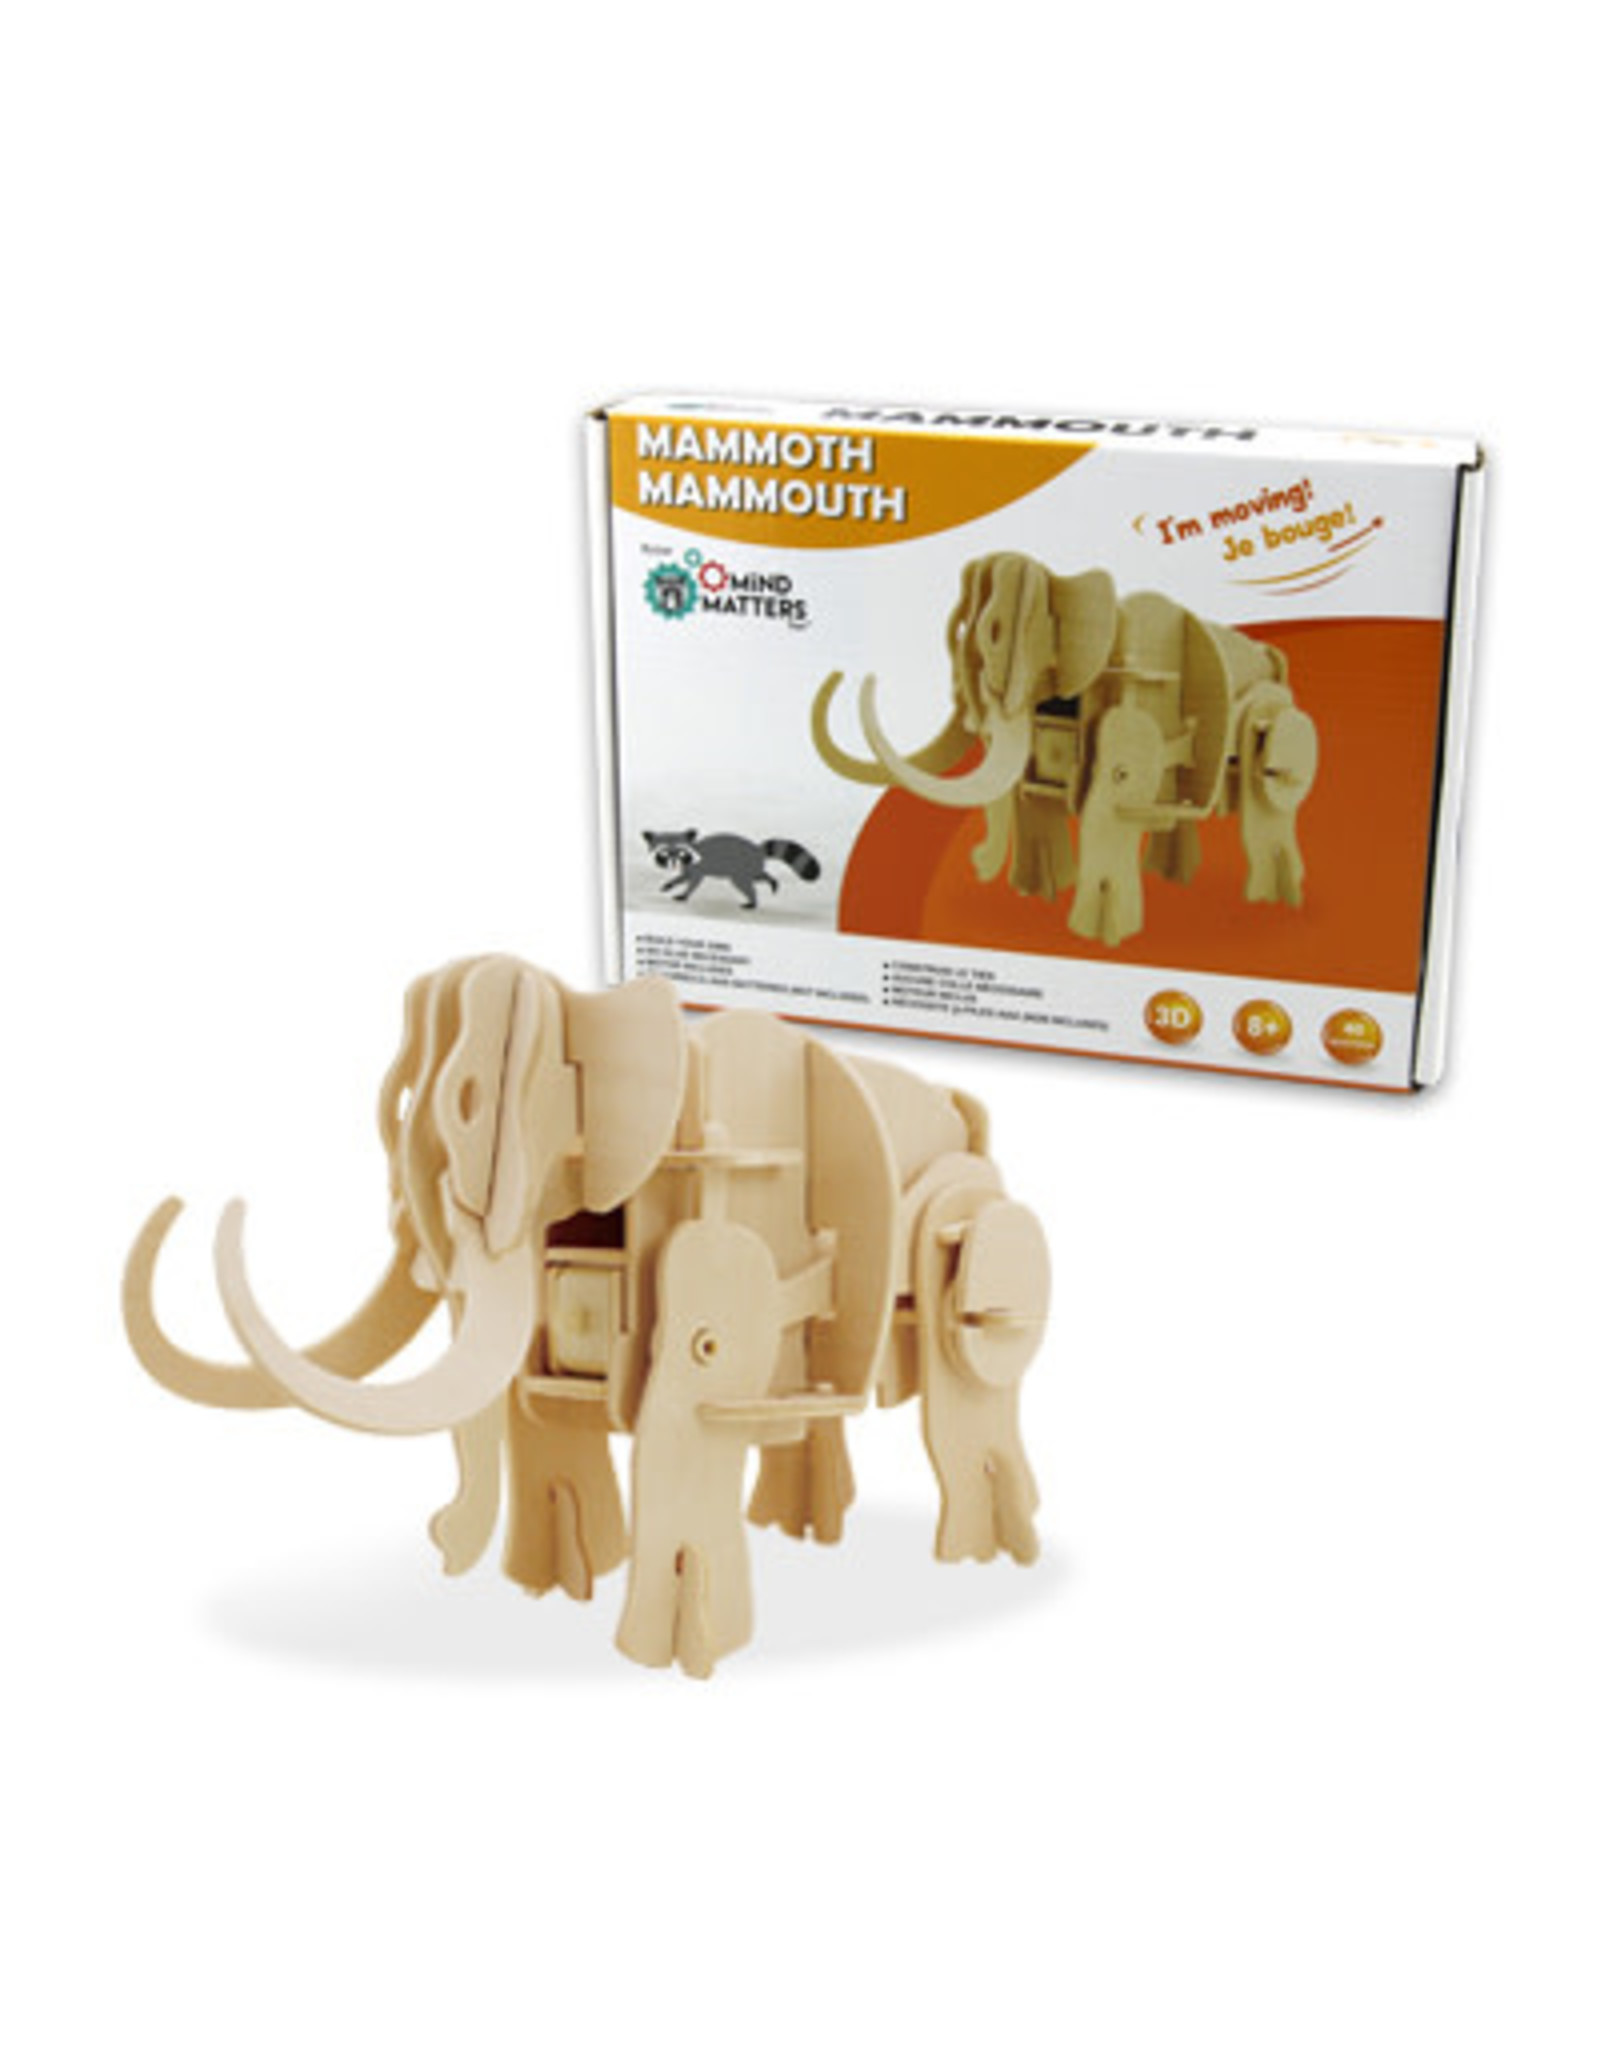 Walking Mammoth